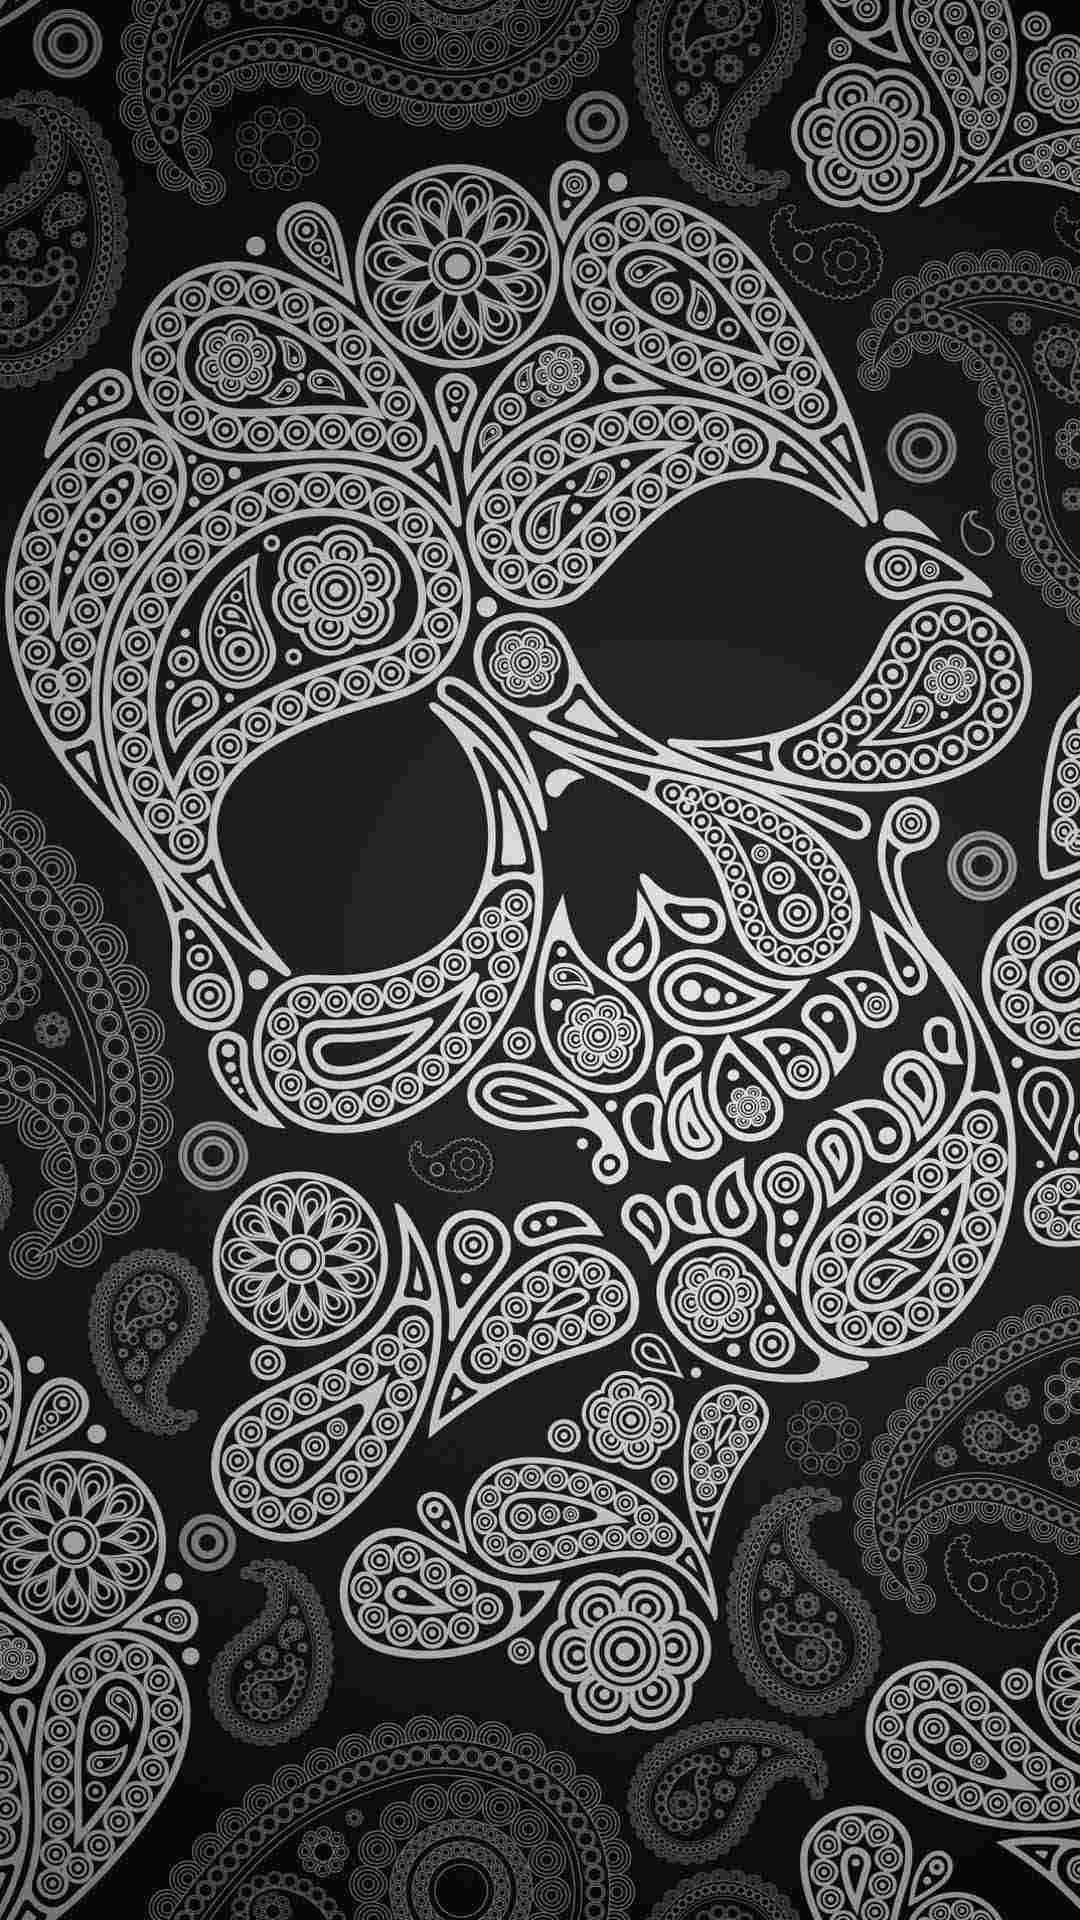 Sugar Skull Wallpaper For Iphone 62 Images